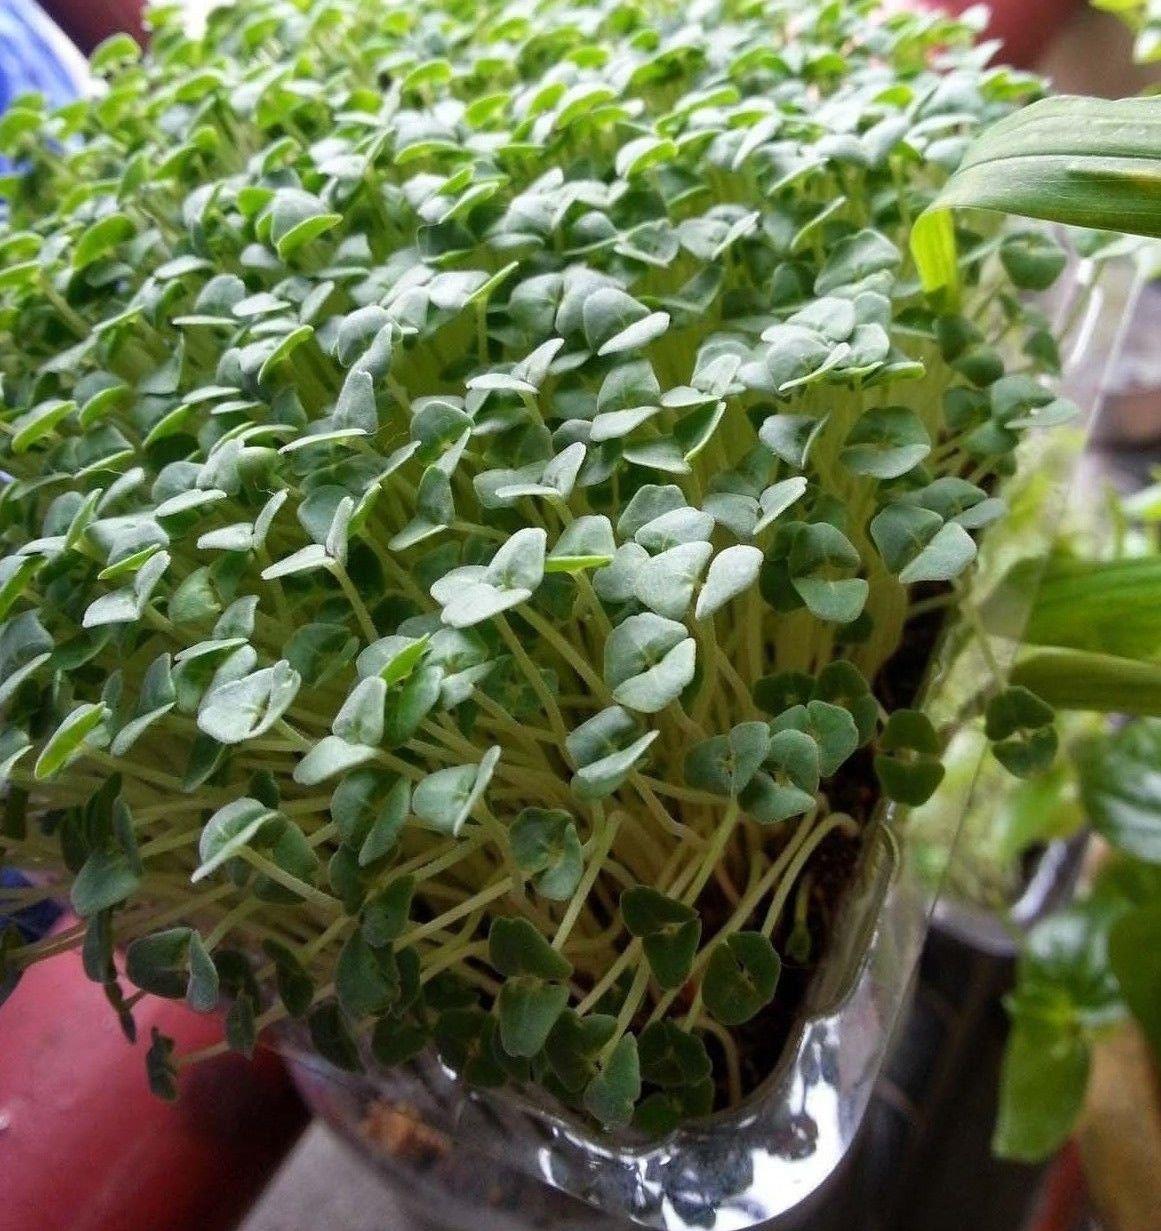 Chia Salvia hispanica 1000 seeds * Non GMO * ez grow * *SHIPPING FROM US* CombSH E24